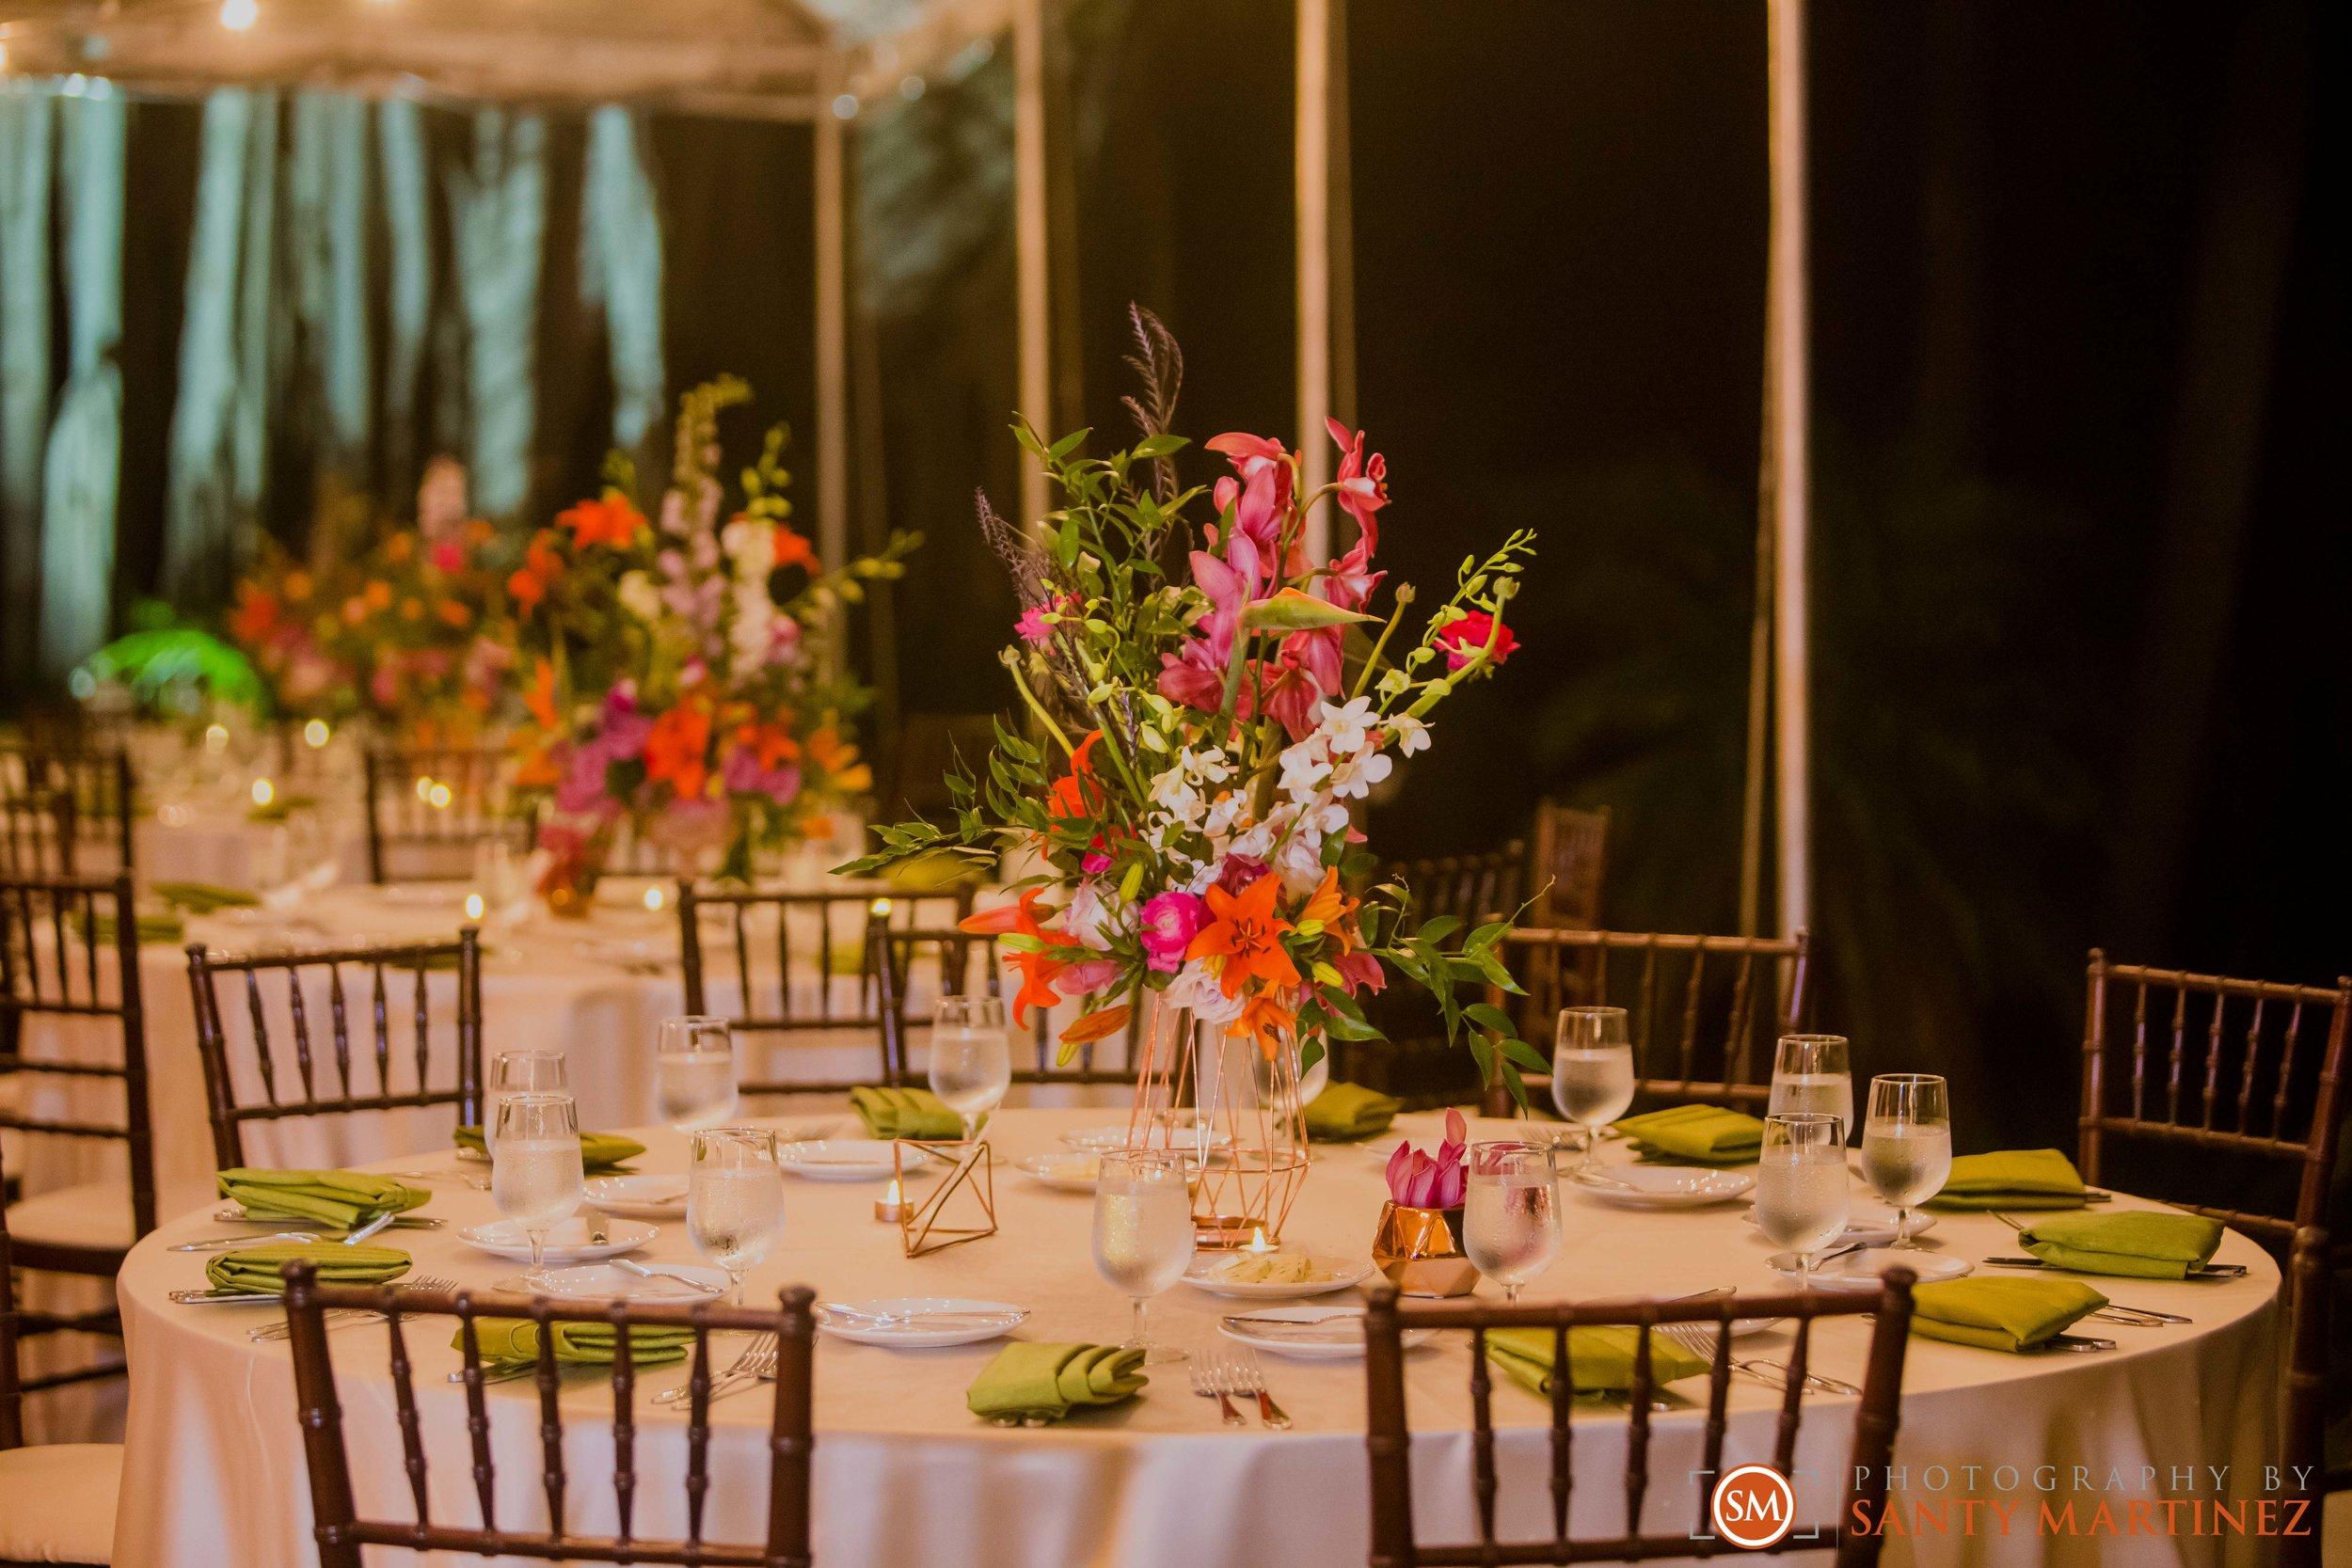 Wedding Bonnet House - Photography by Santy Martinez-31.jpg